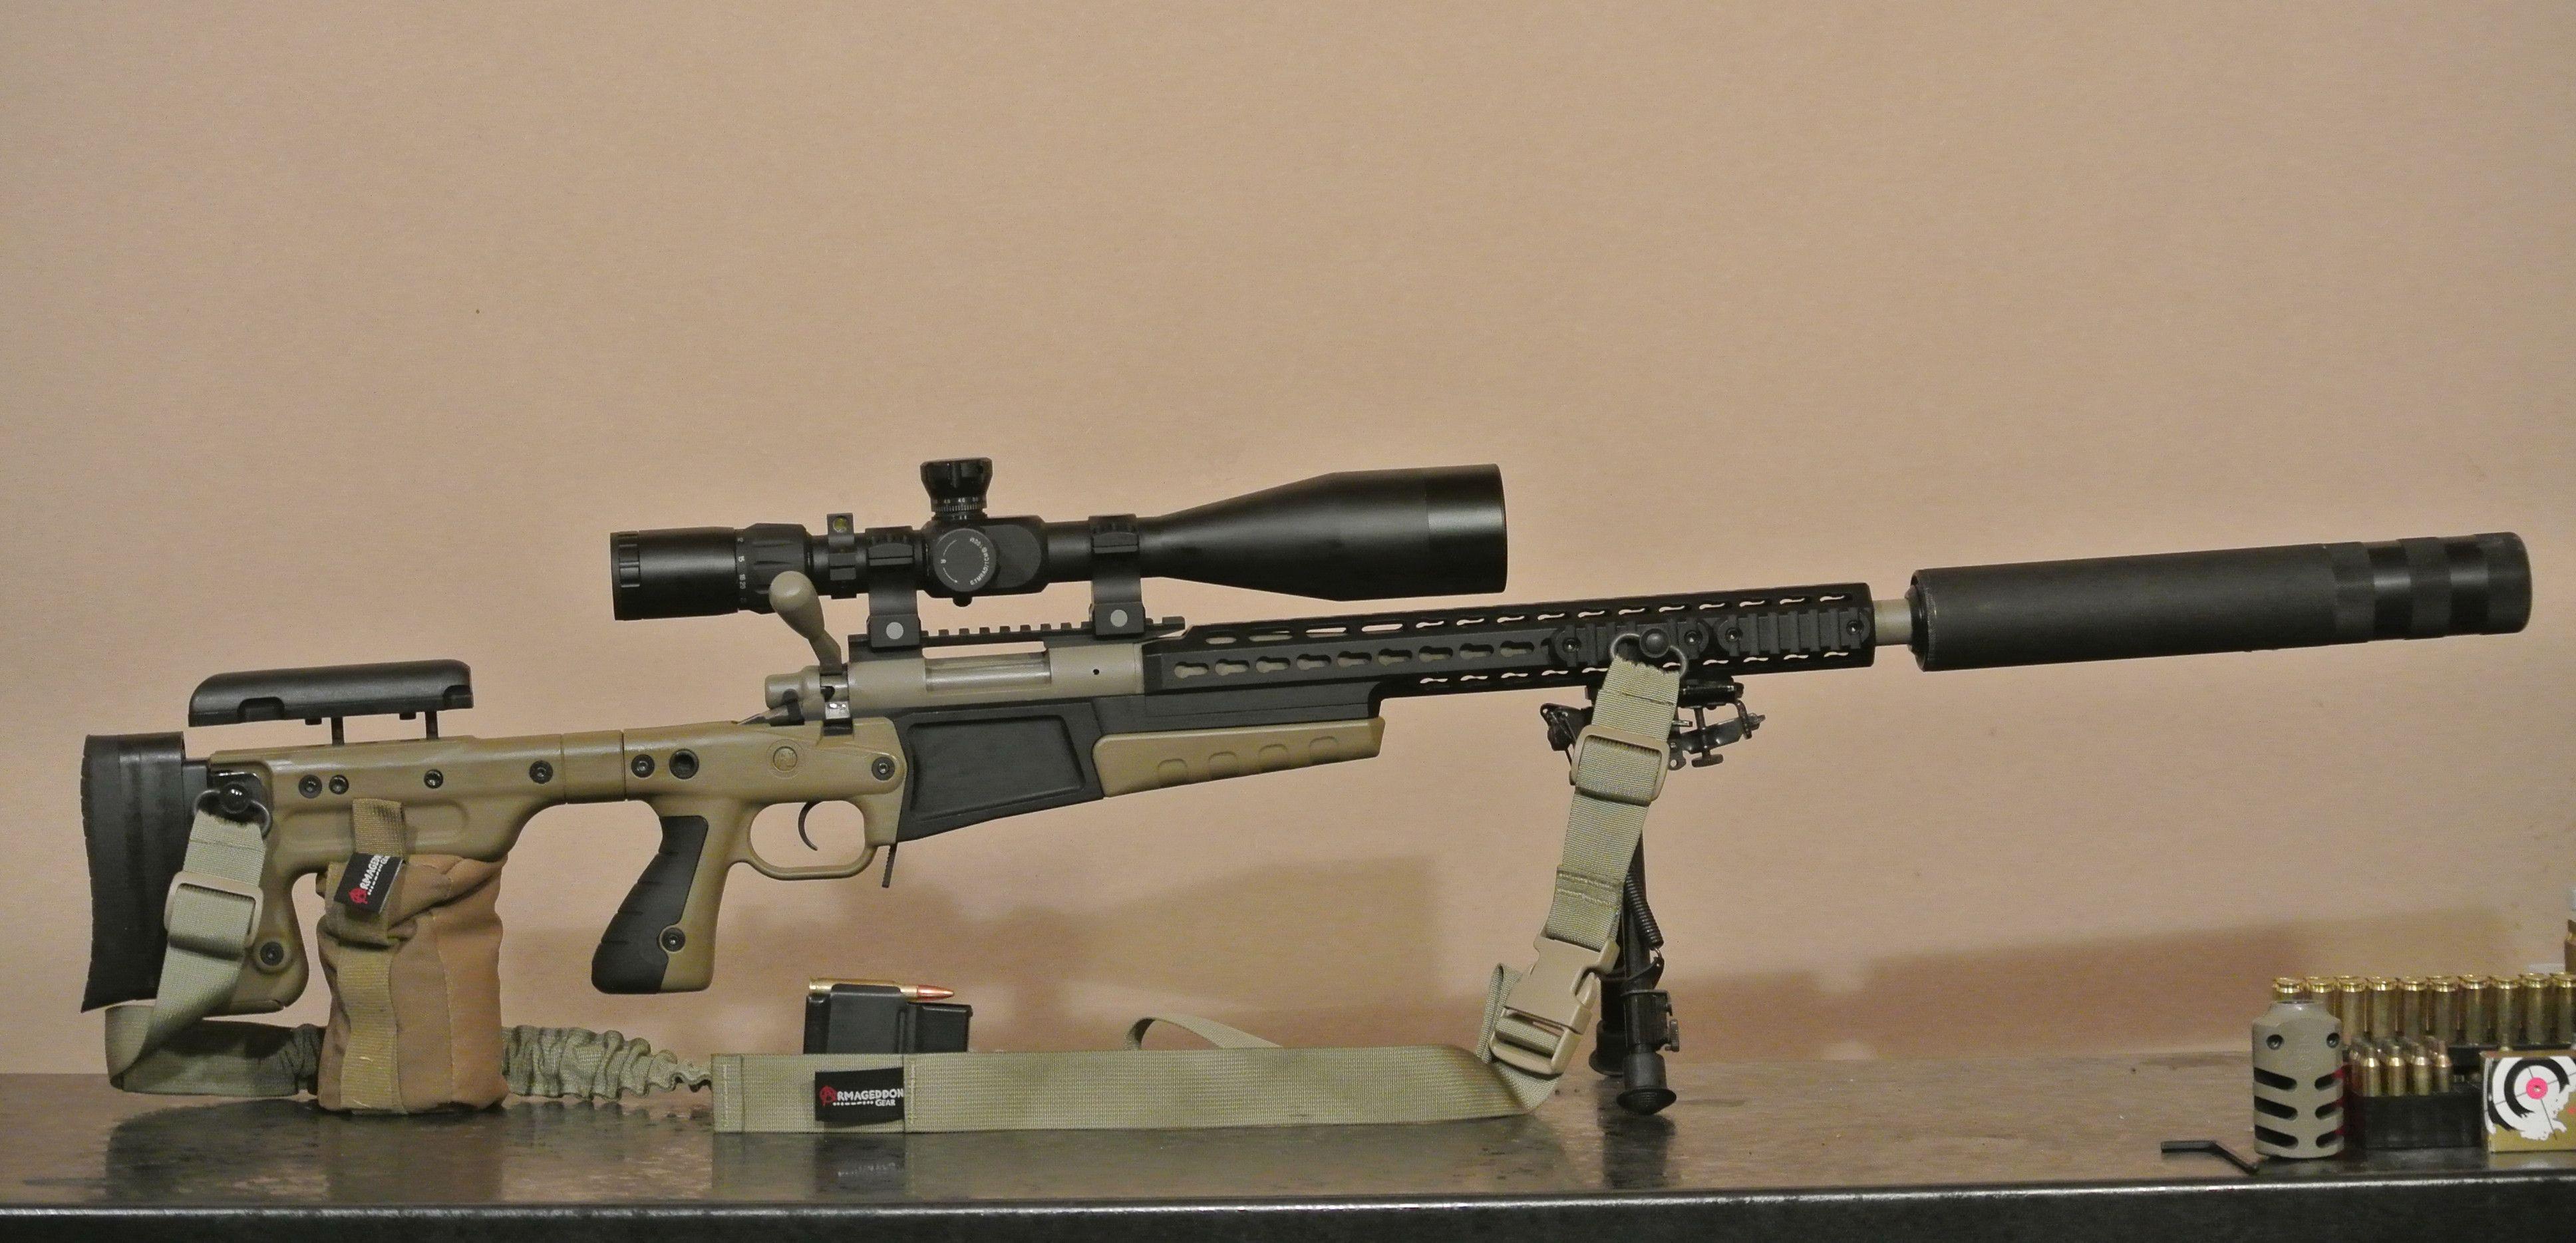 Suppressed Remington 700 Wearing tan dark earth